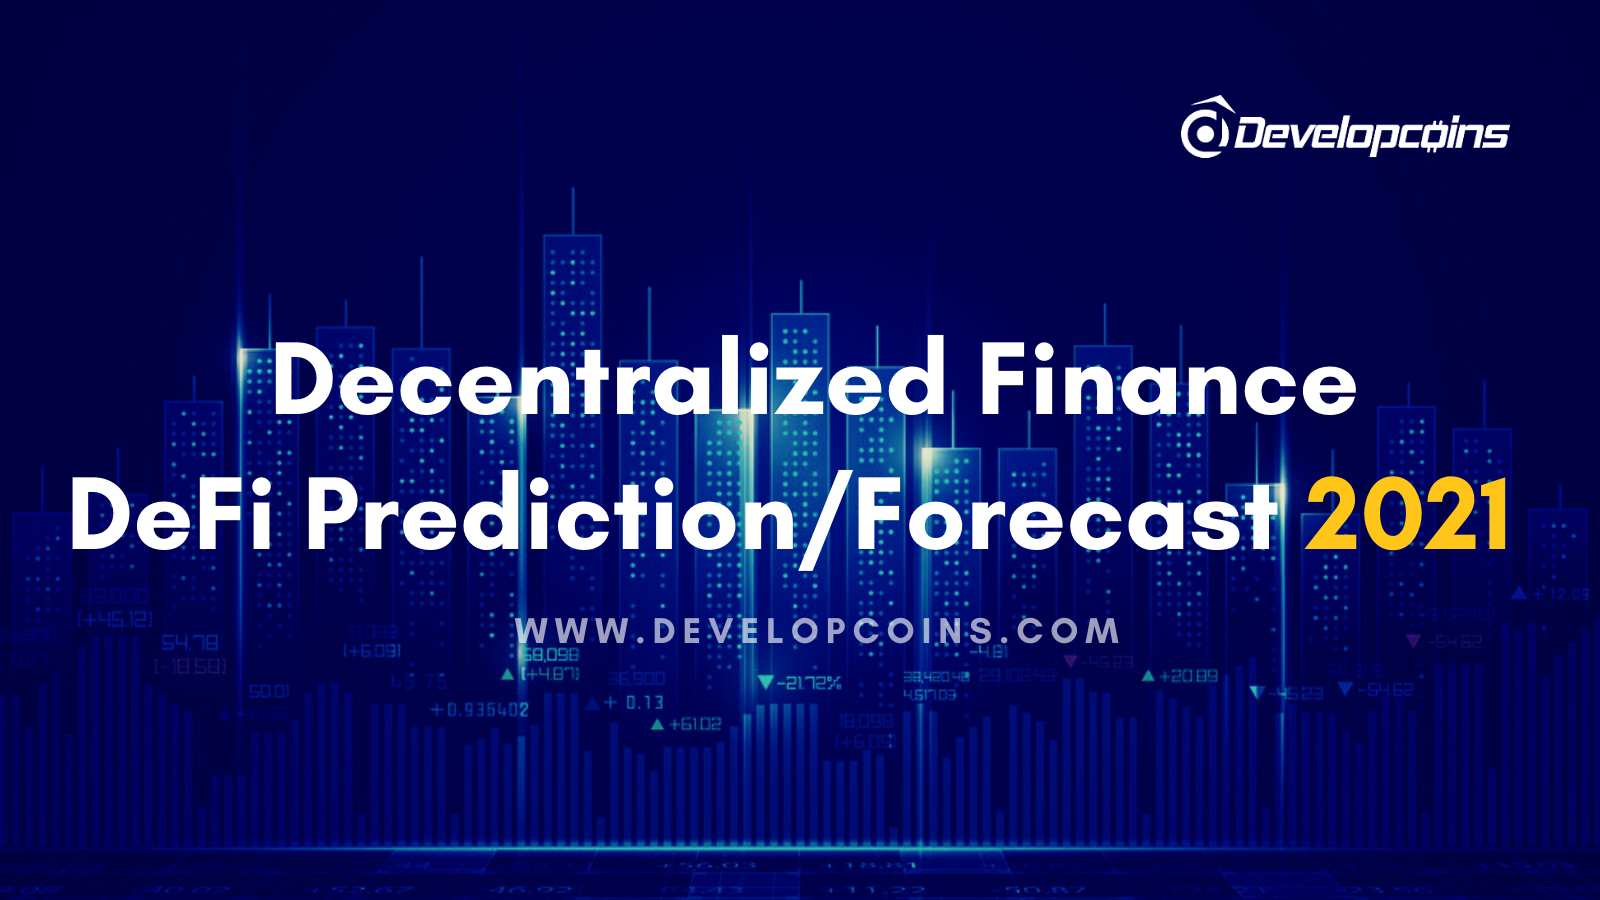 Decentralized Finance (DeFi) Price Prediction / Forecast 2021